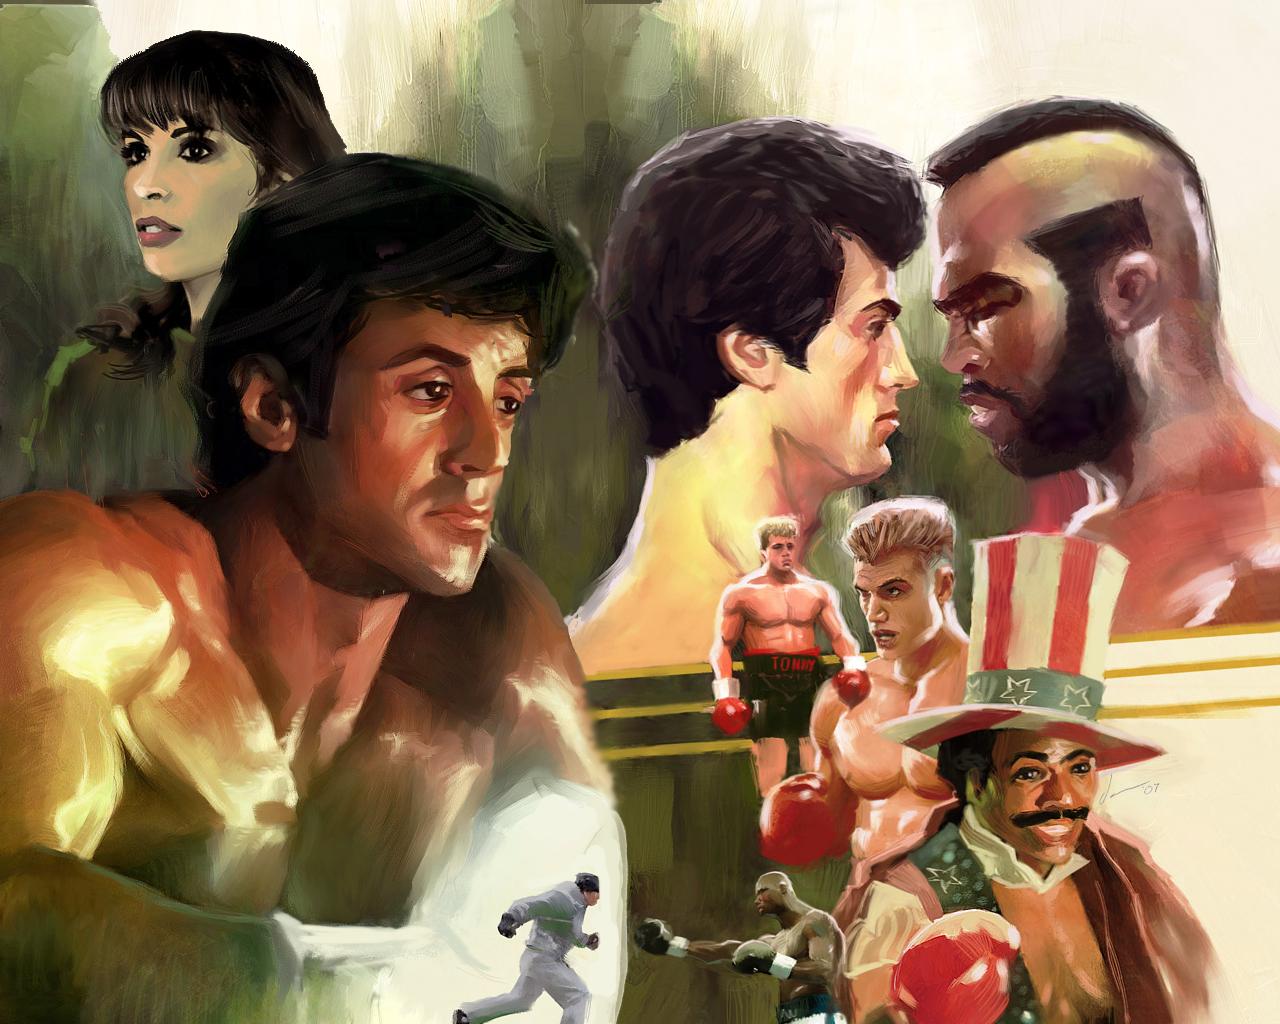 rocky balboa collage the movie redneck 637453 1280x1024